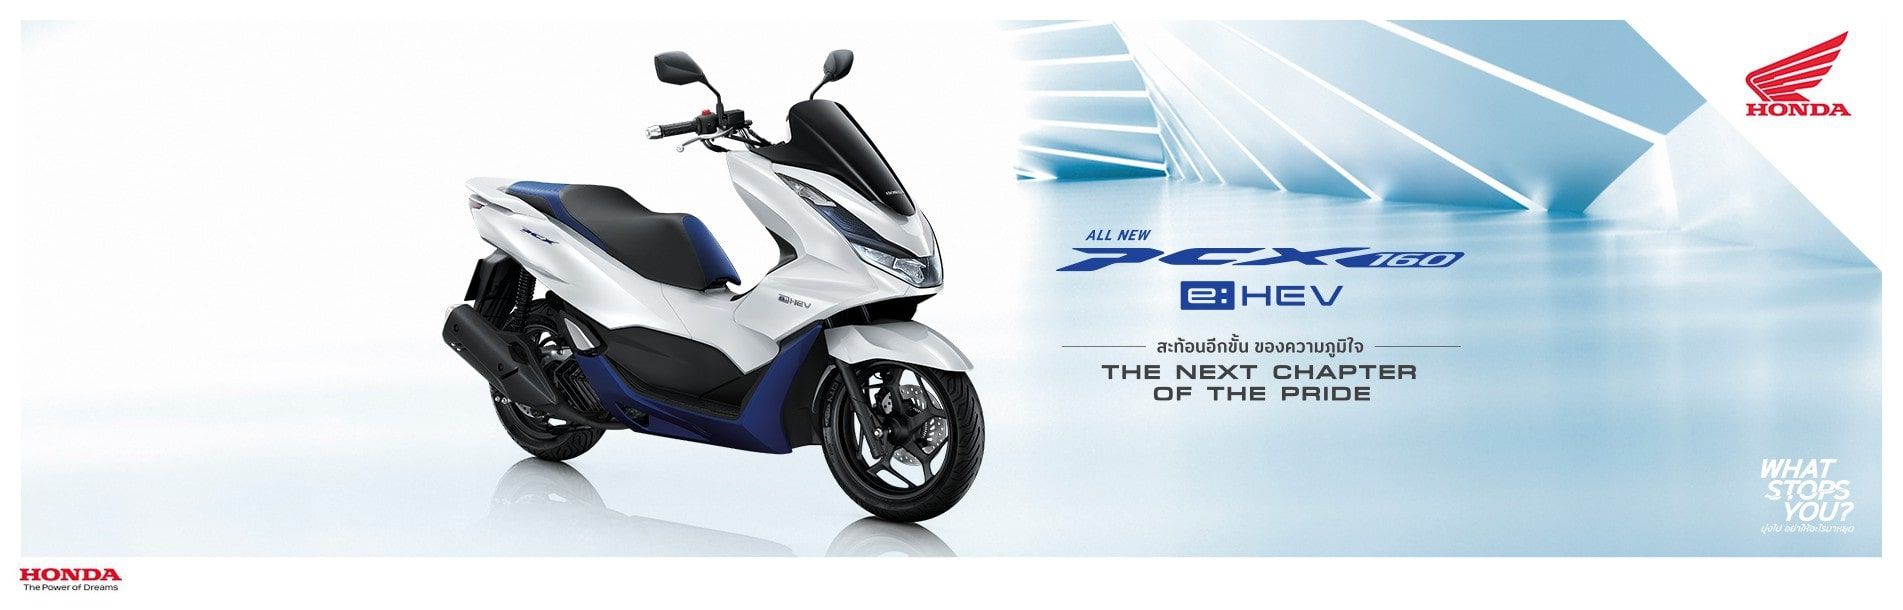 All New PCX 160 EHEV